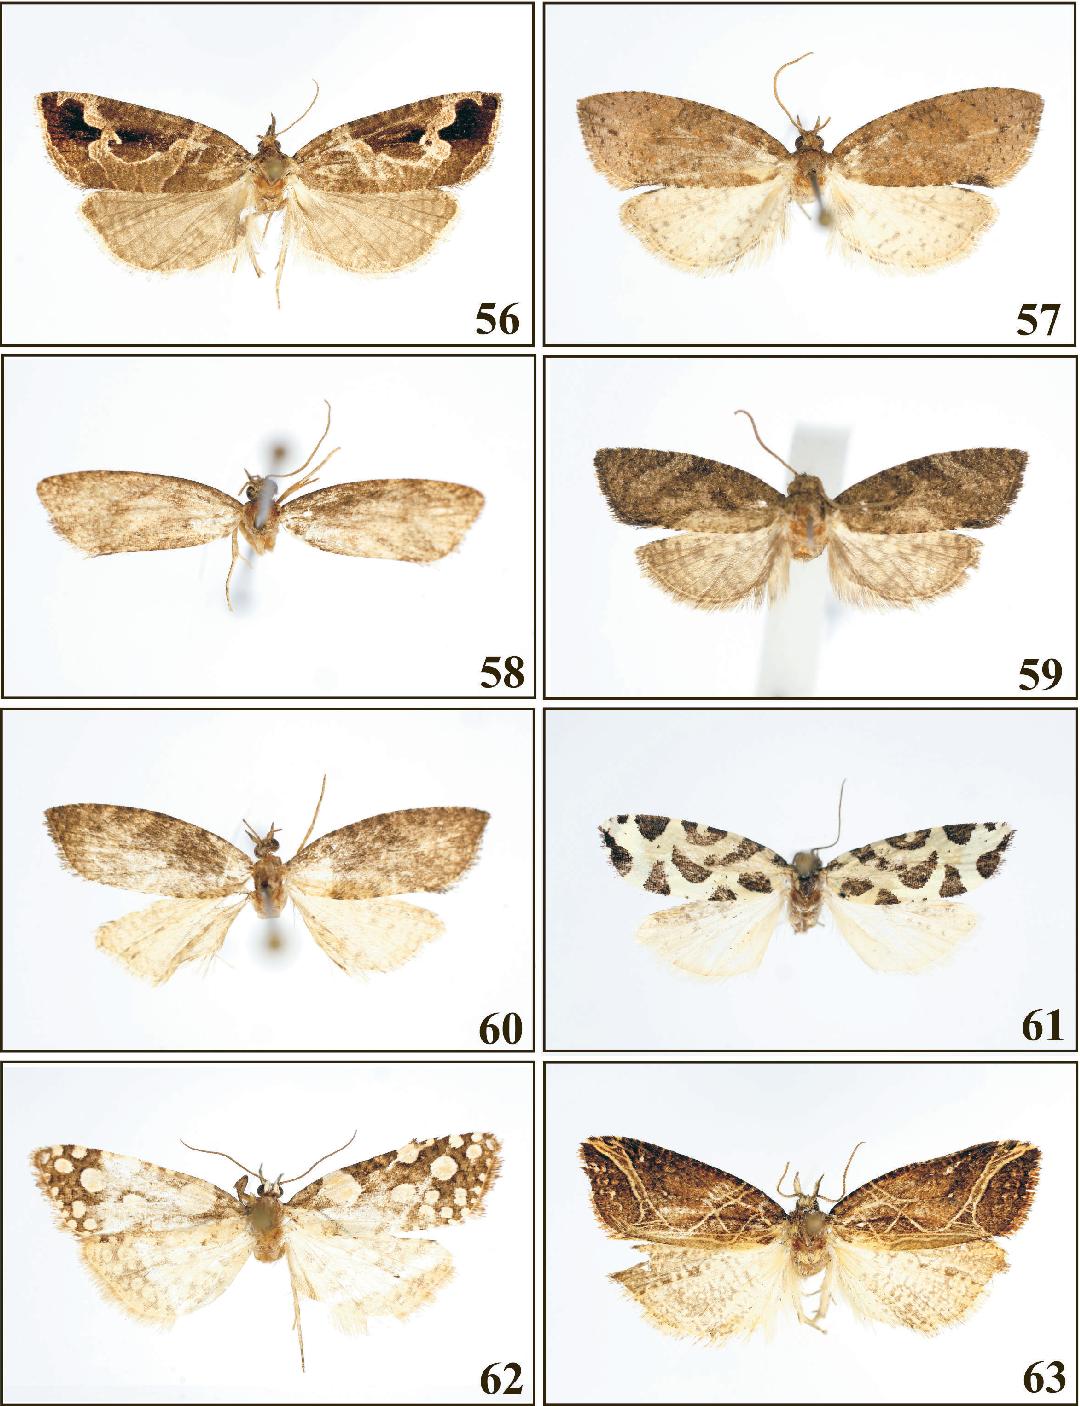 figure 56-63